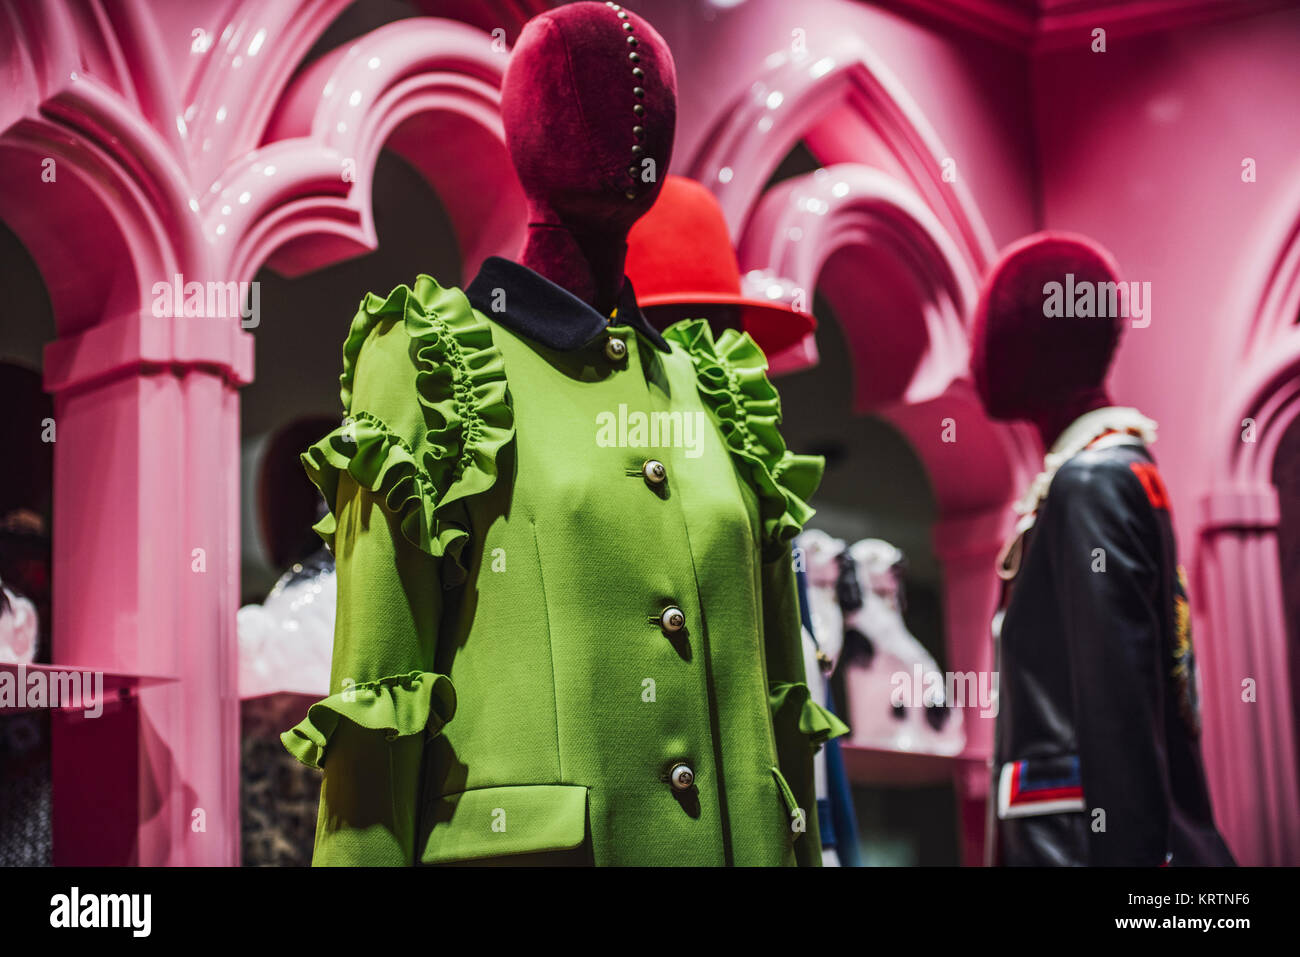 Milan, Italy - November 12, 2016: Dolce and Gabbana store in Milan, Italy. - Stock Image